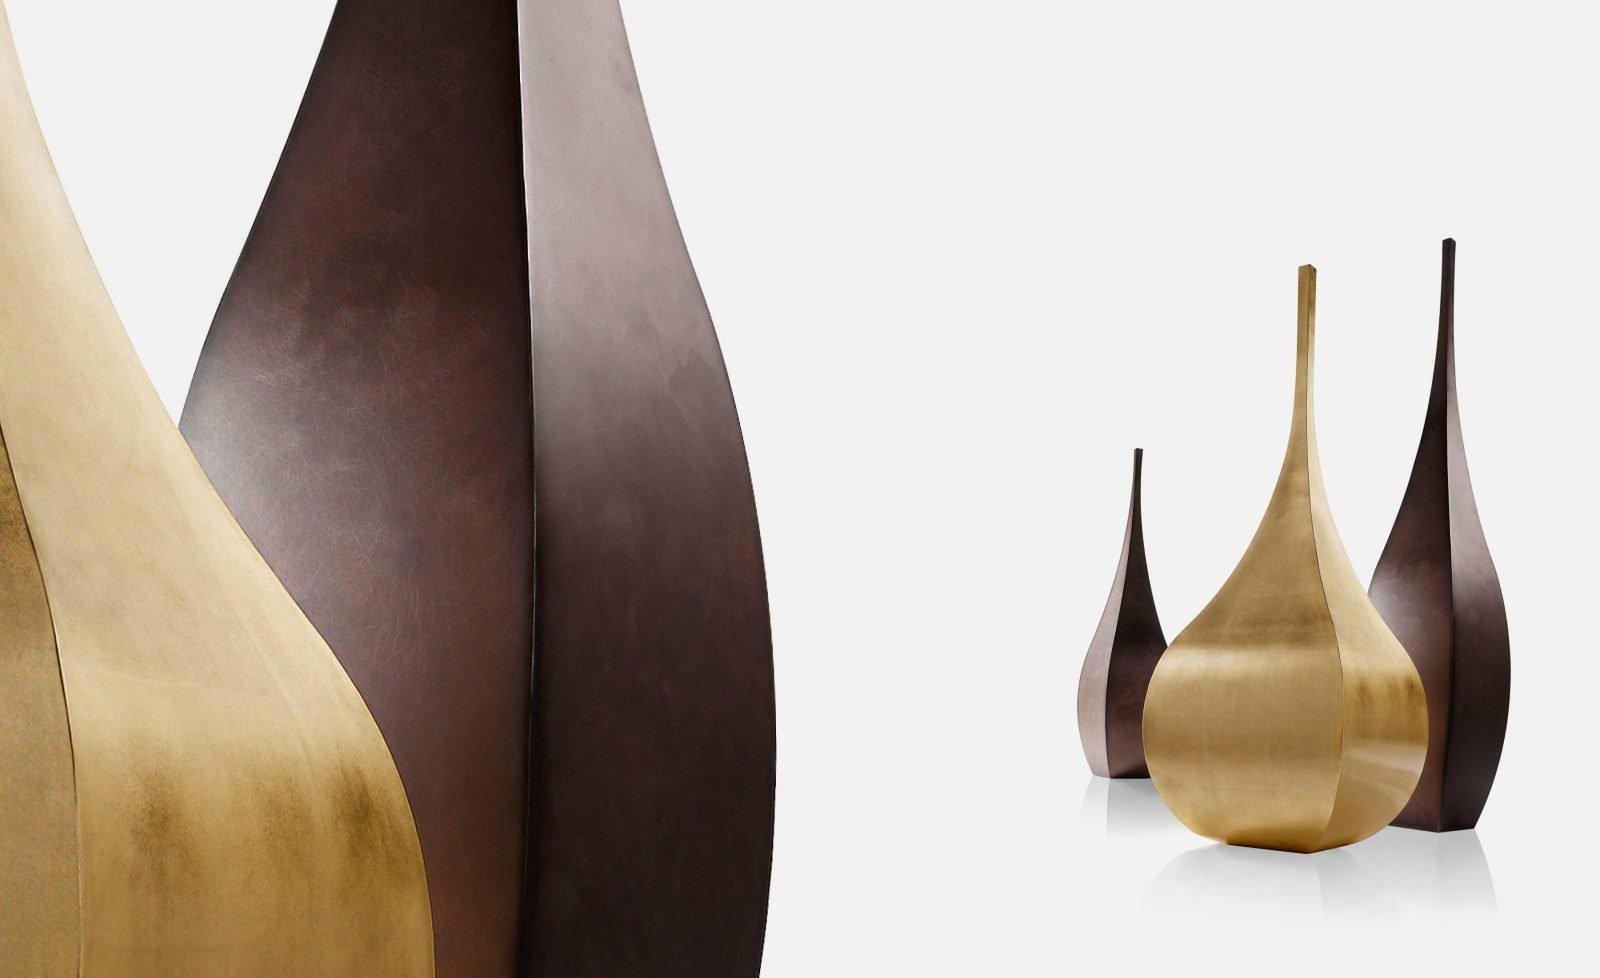 Shimla & Jaipur planter from De Castelli, designed by Stefano Dussin